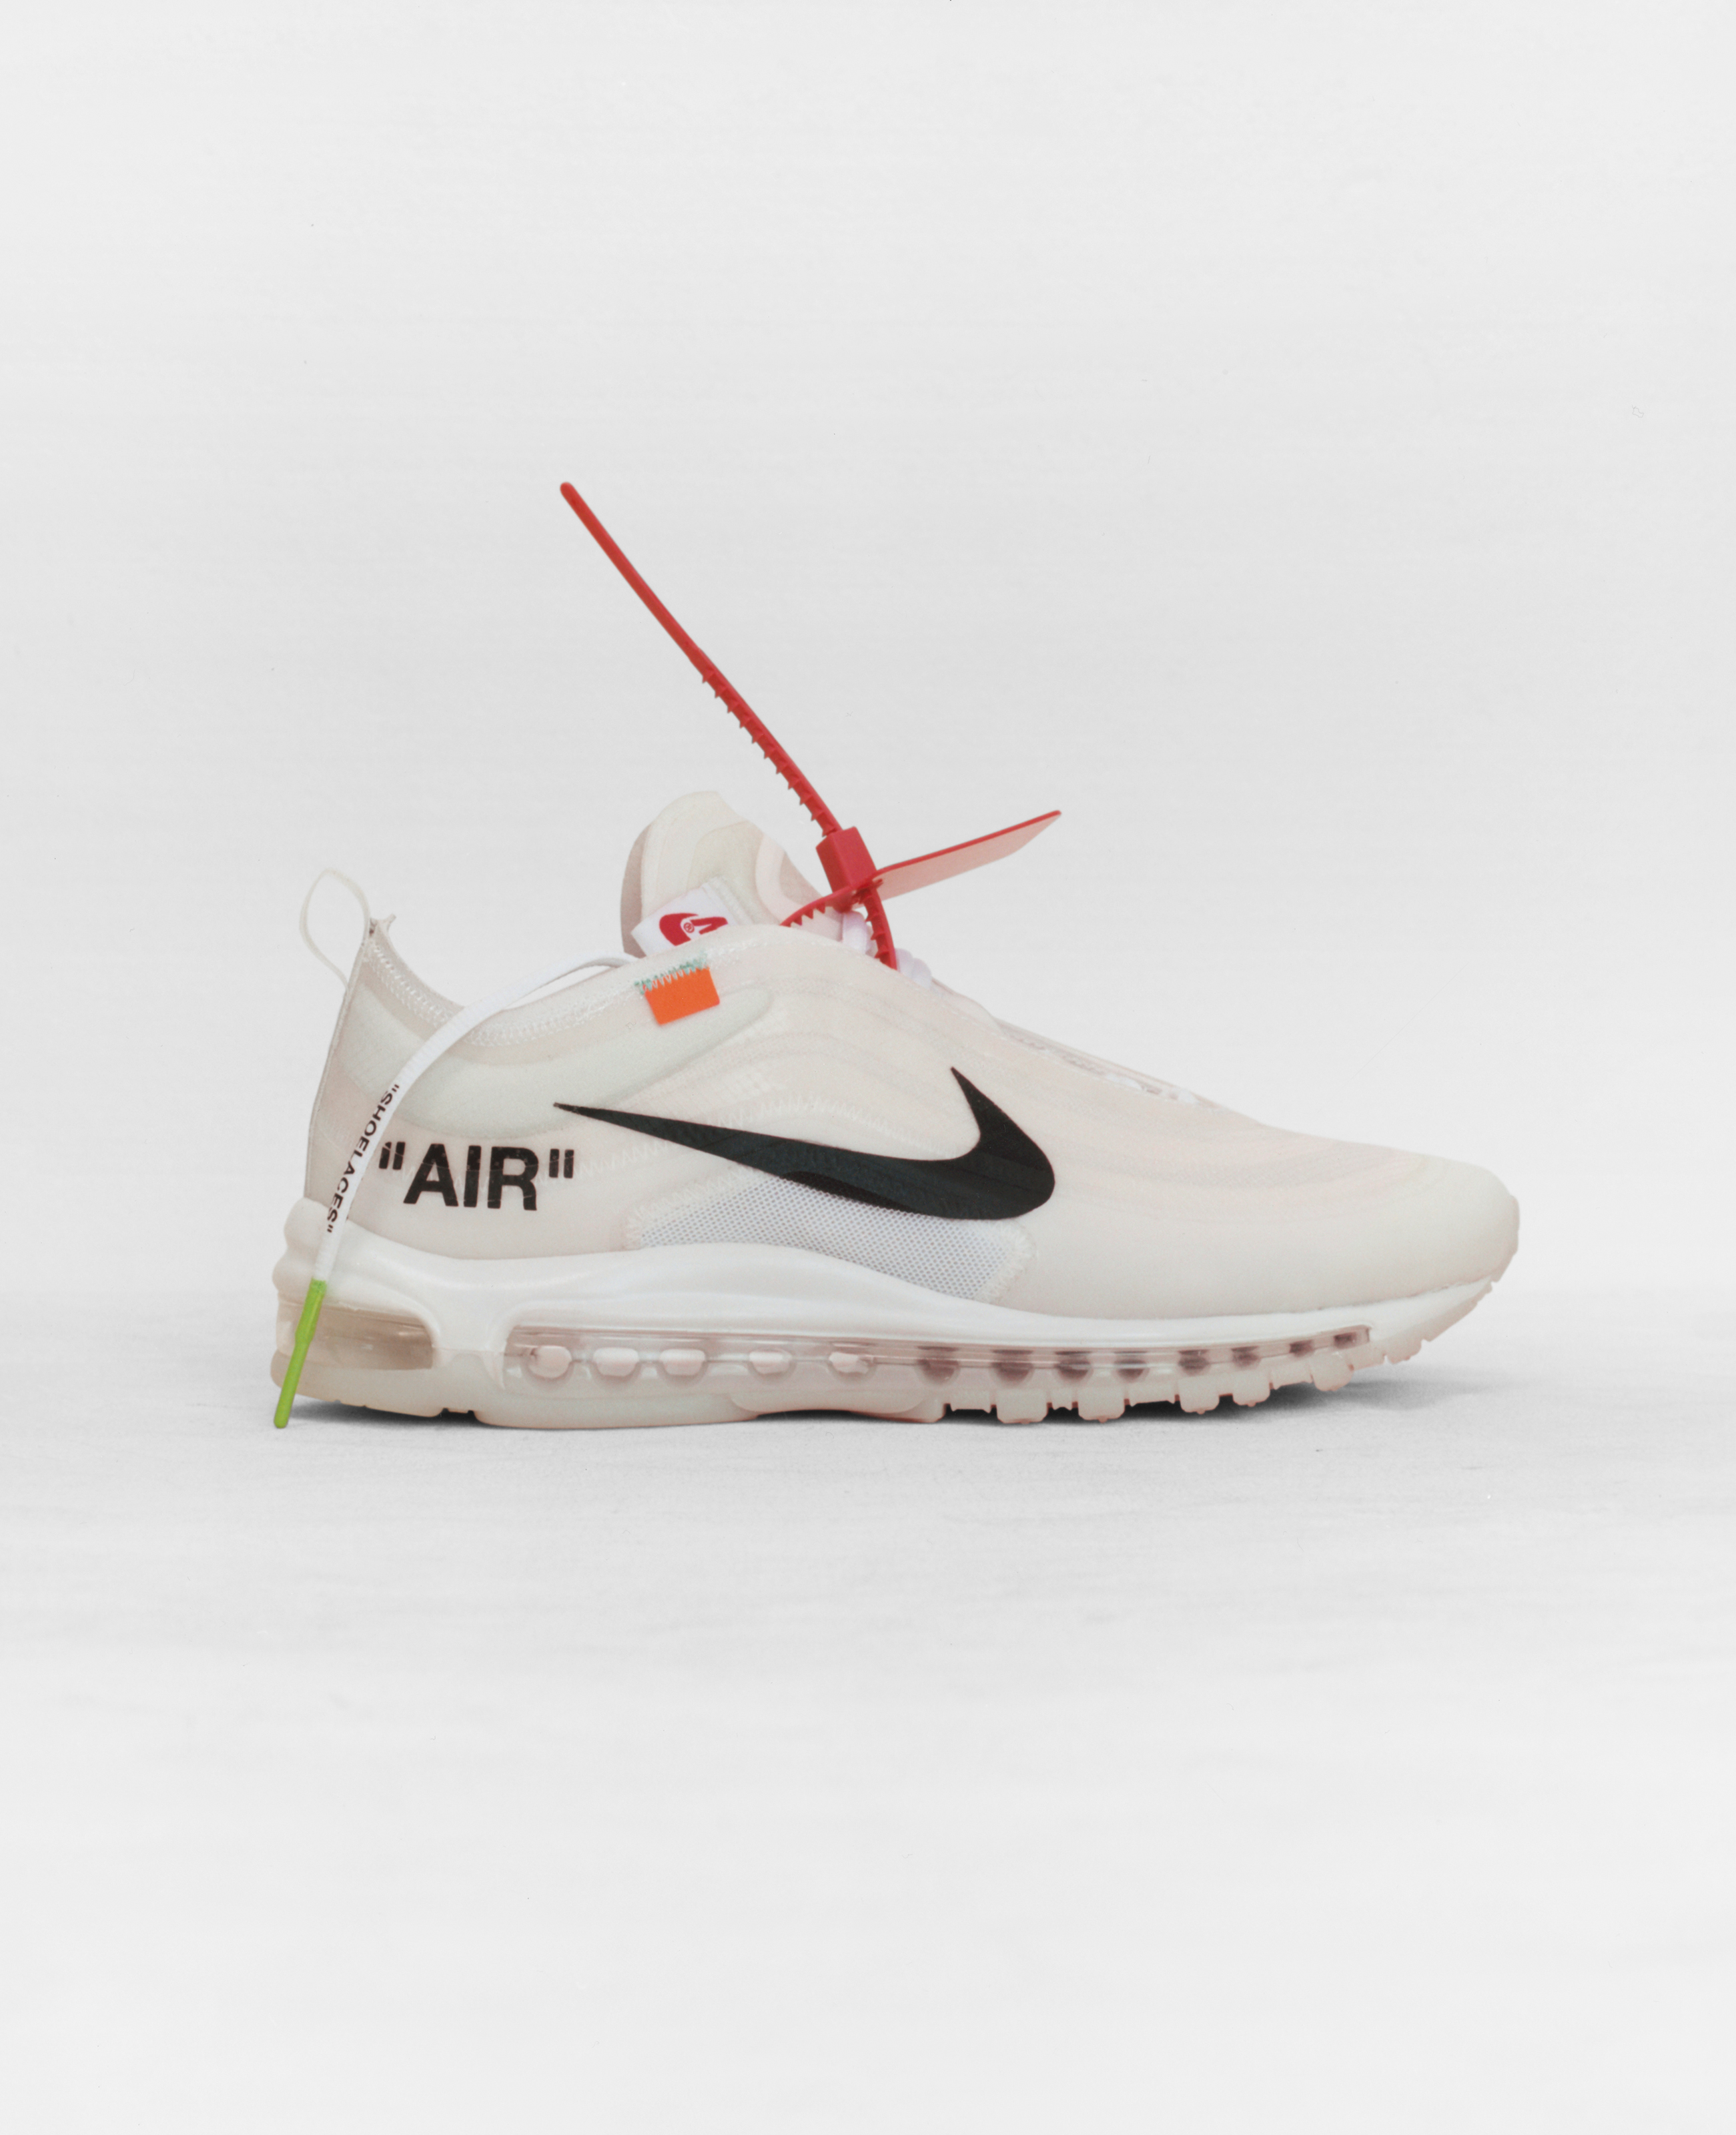 Virgil-Abloh-Nike-The10-14_73202.jpg